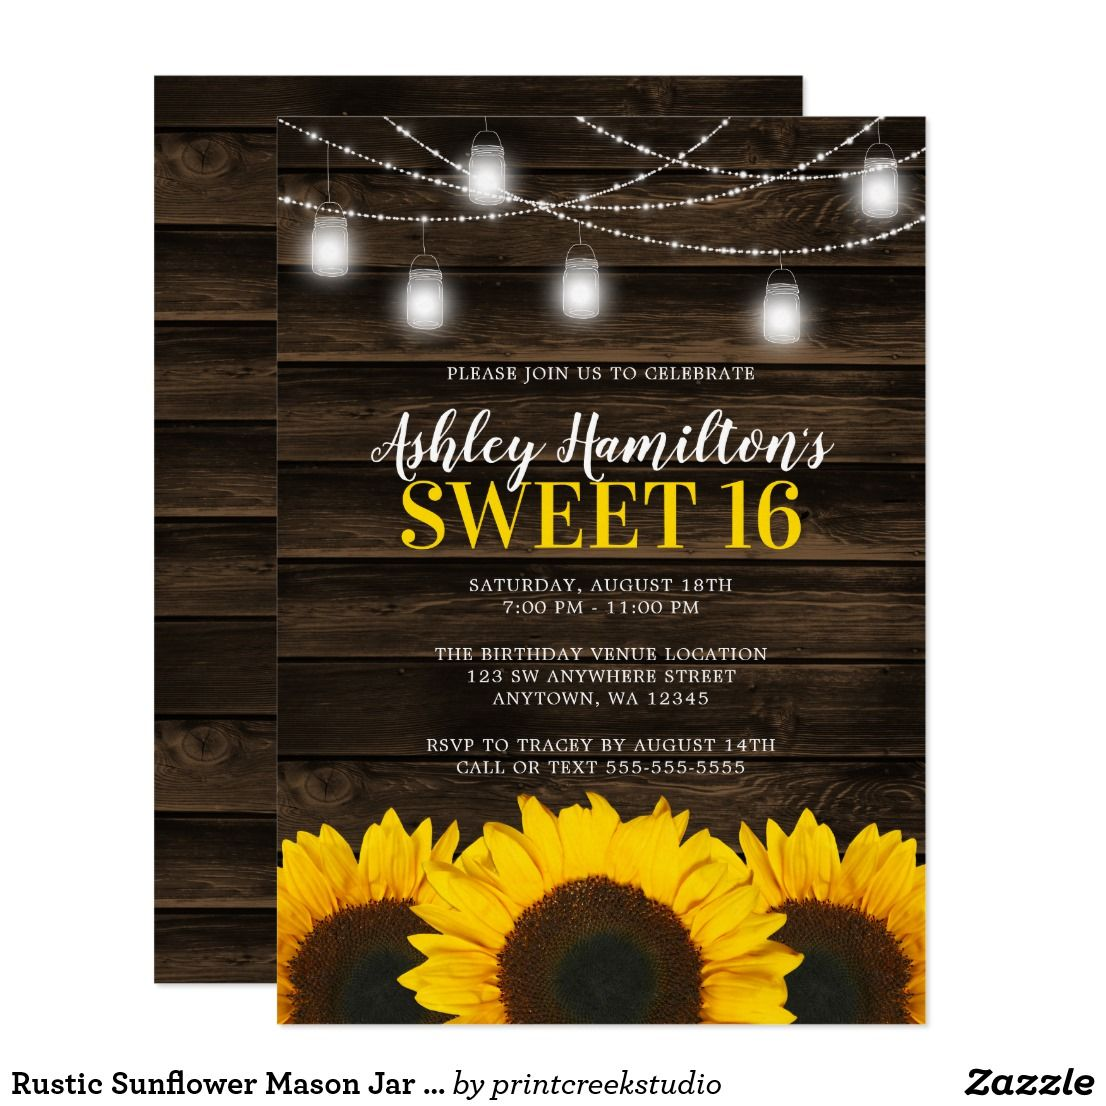 Rustic Sunflower Mason Jar Lights Sweet 16 Invitation | Zazzle.com #sweetsixteen